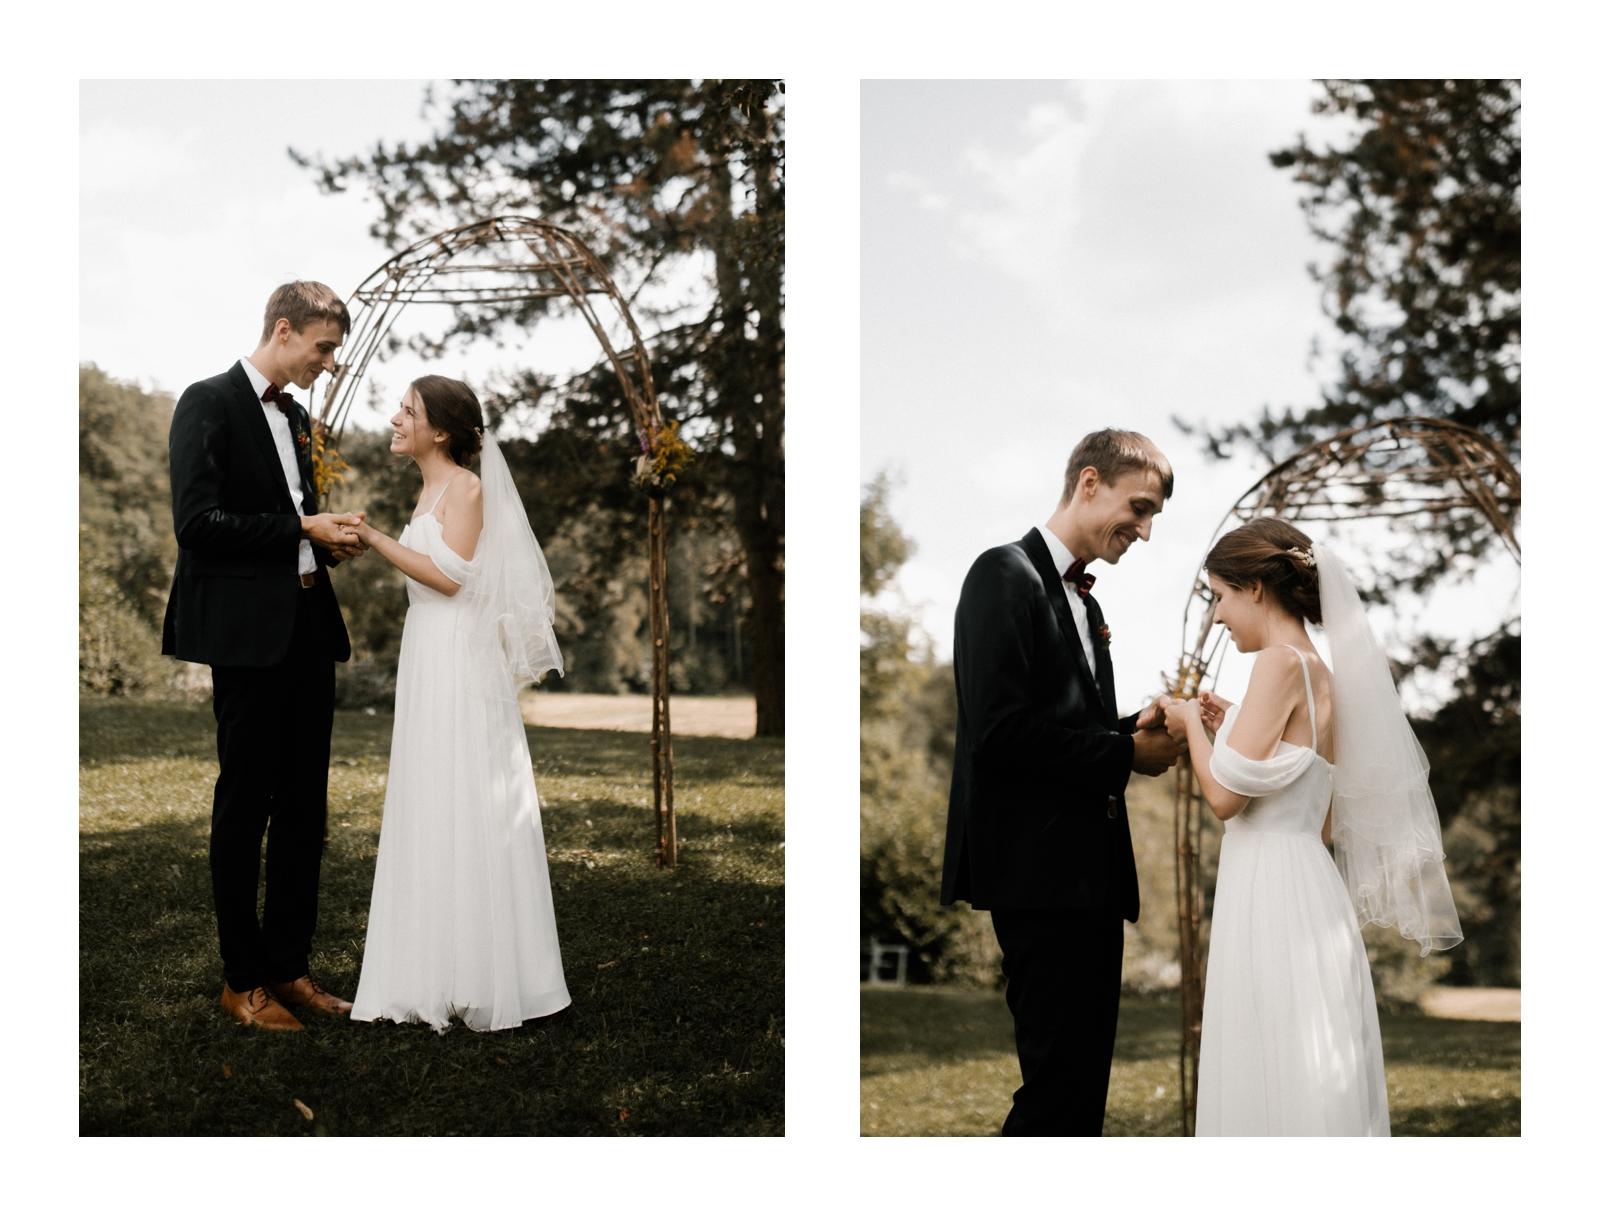 mirjam_thomas_wedding-397.jpg